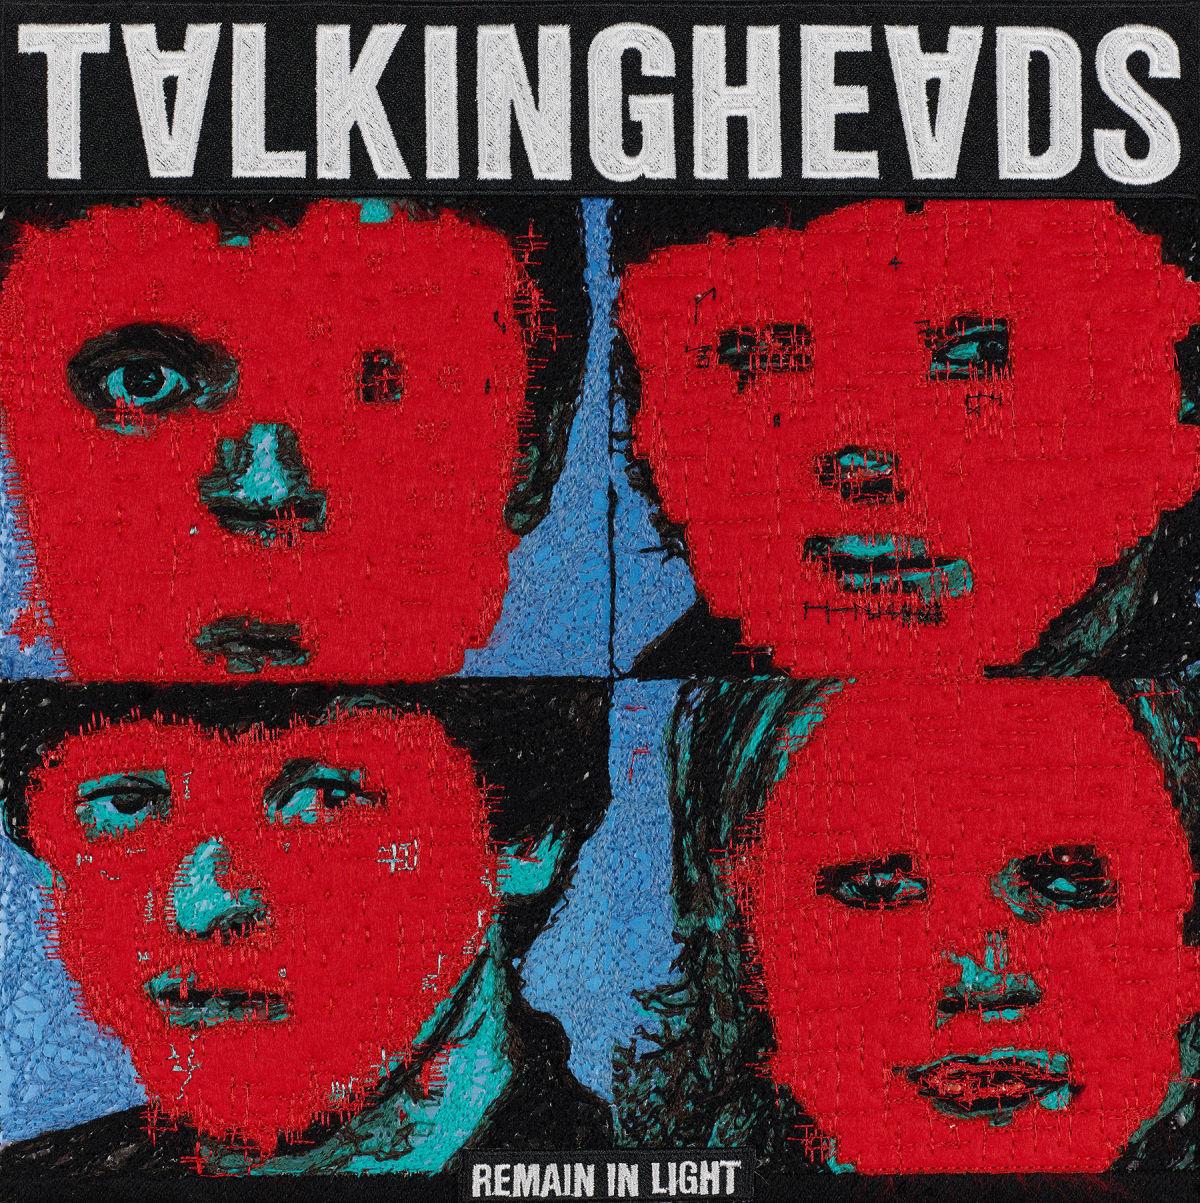 Stephen Wilson, Remain in Light, Talking Heads, 2019